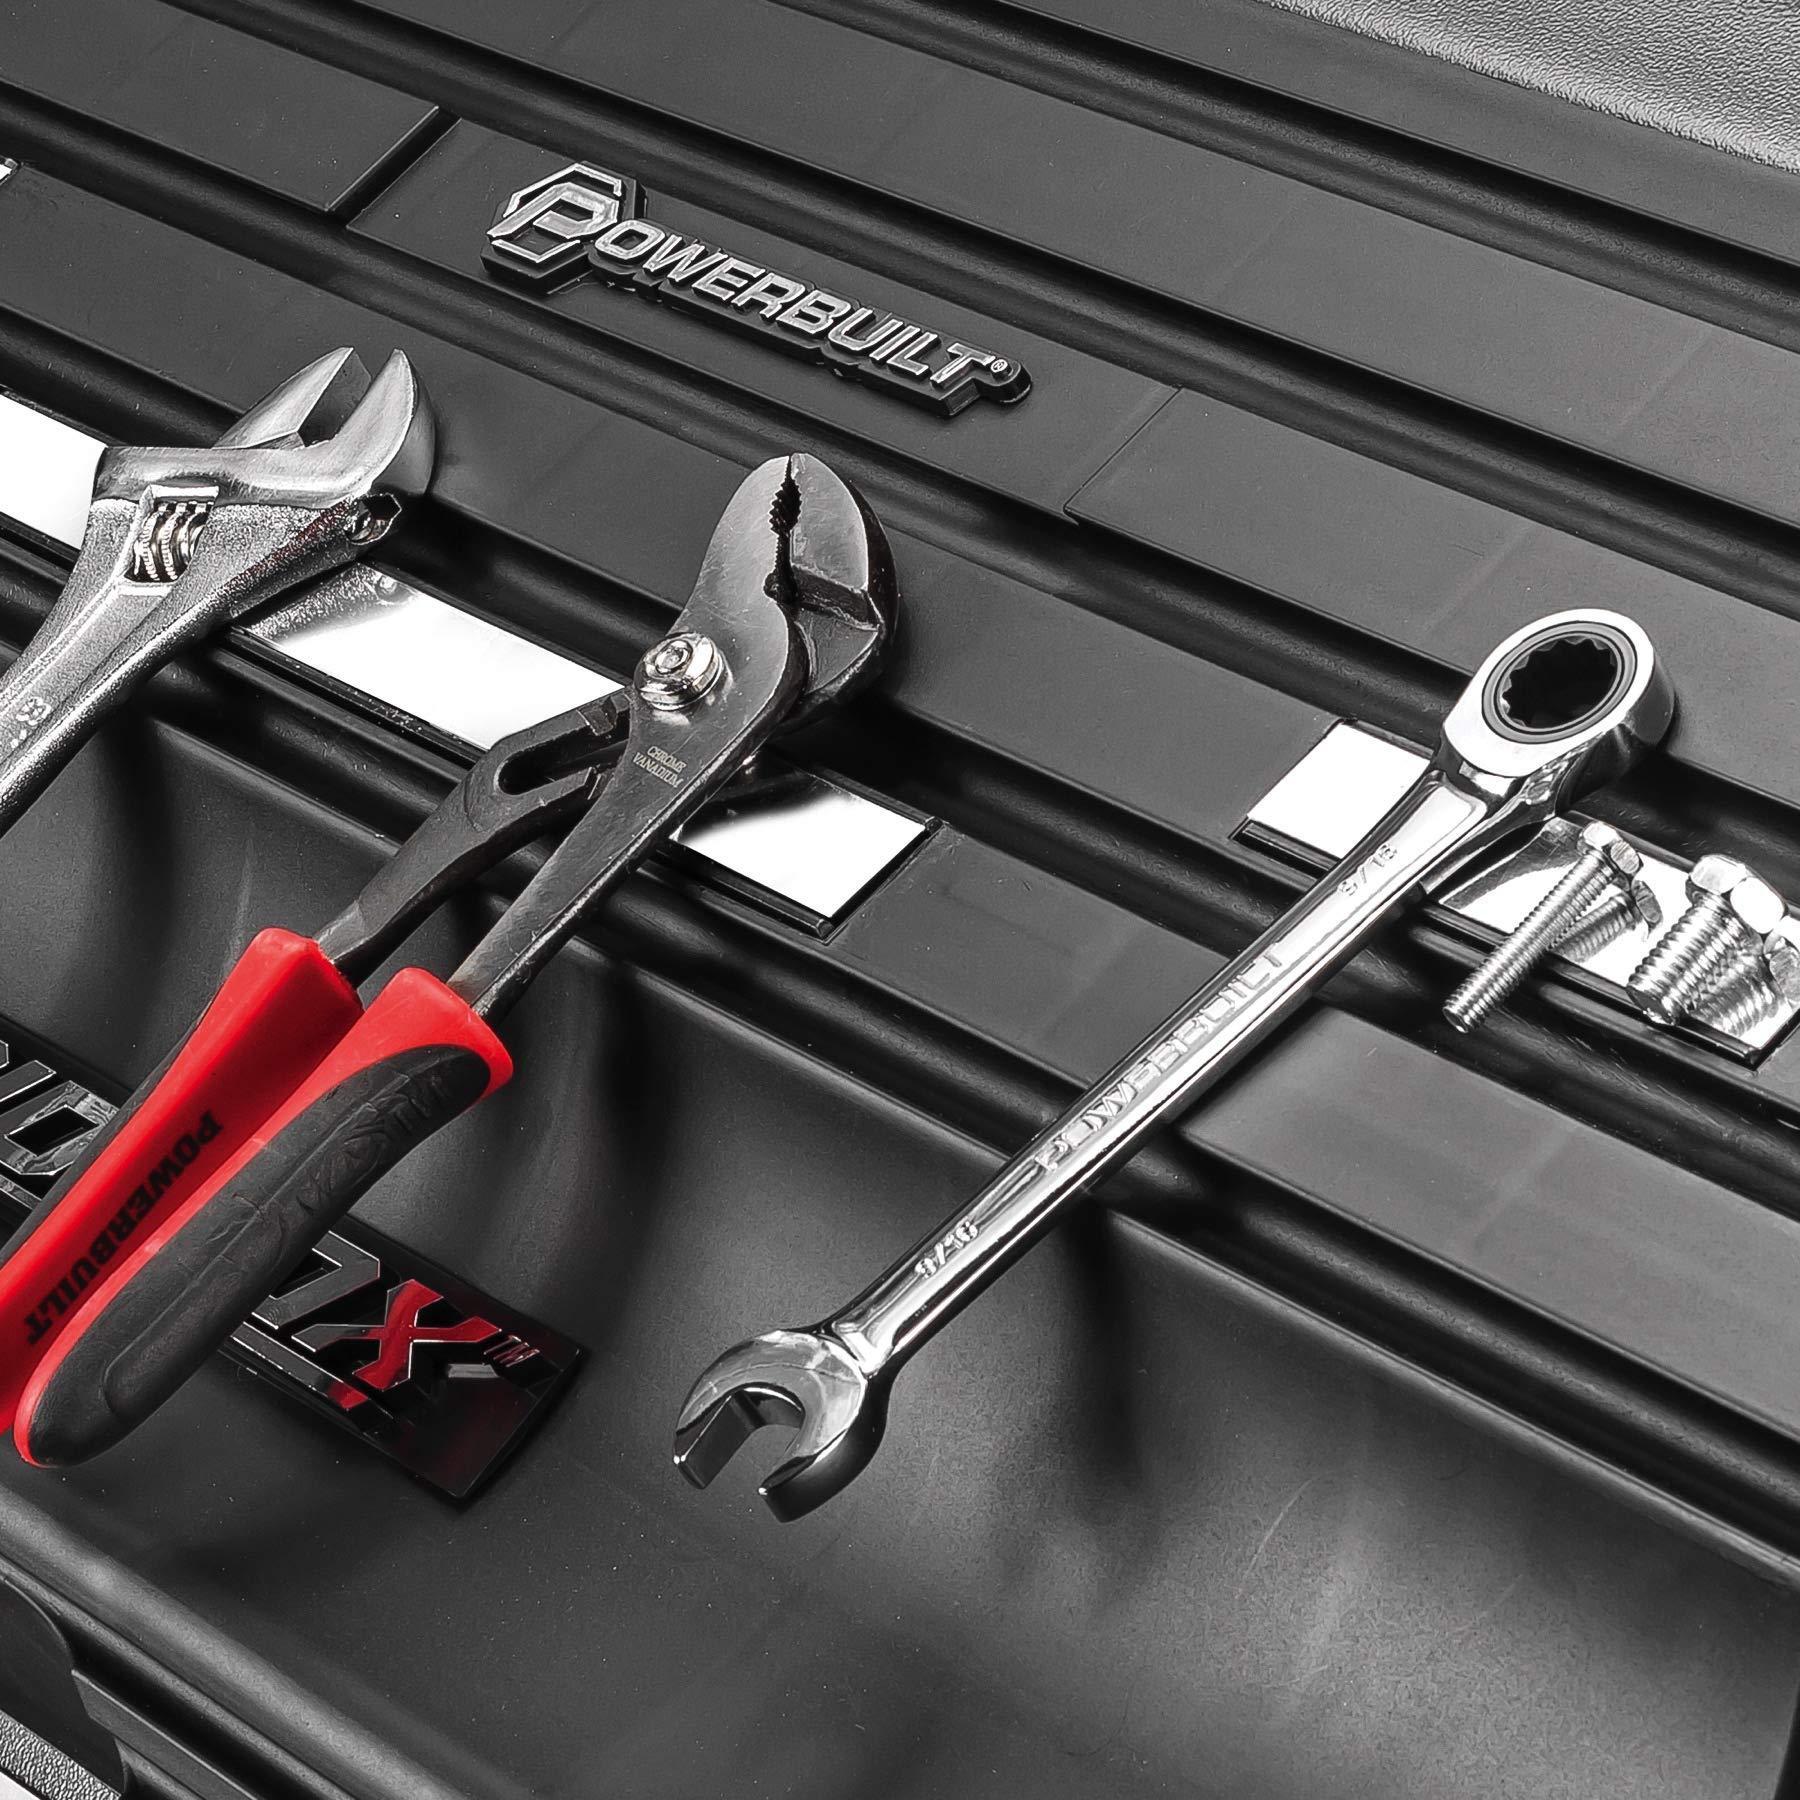 Powerbuilt 26'' Rapid Box Portable Slant Front Tool Box w/Tool Magnets - 240102 by Powerbuillt (Image #3)